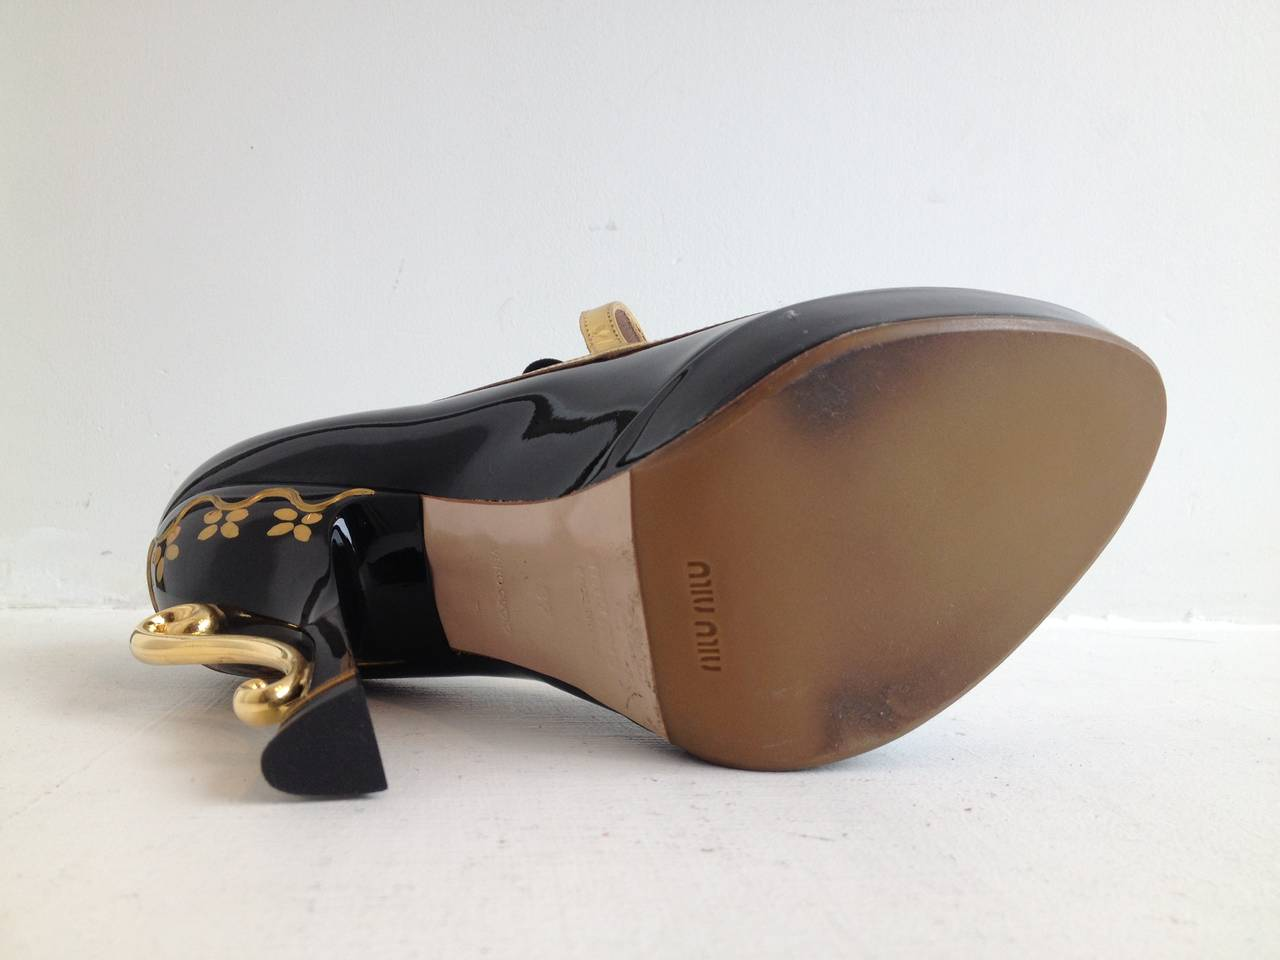 Miu Miu Black Patent Teacup Heels 4